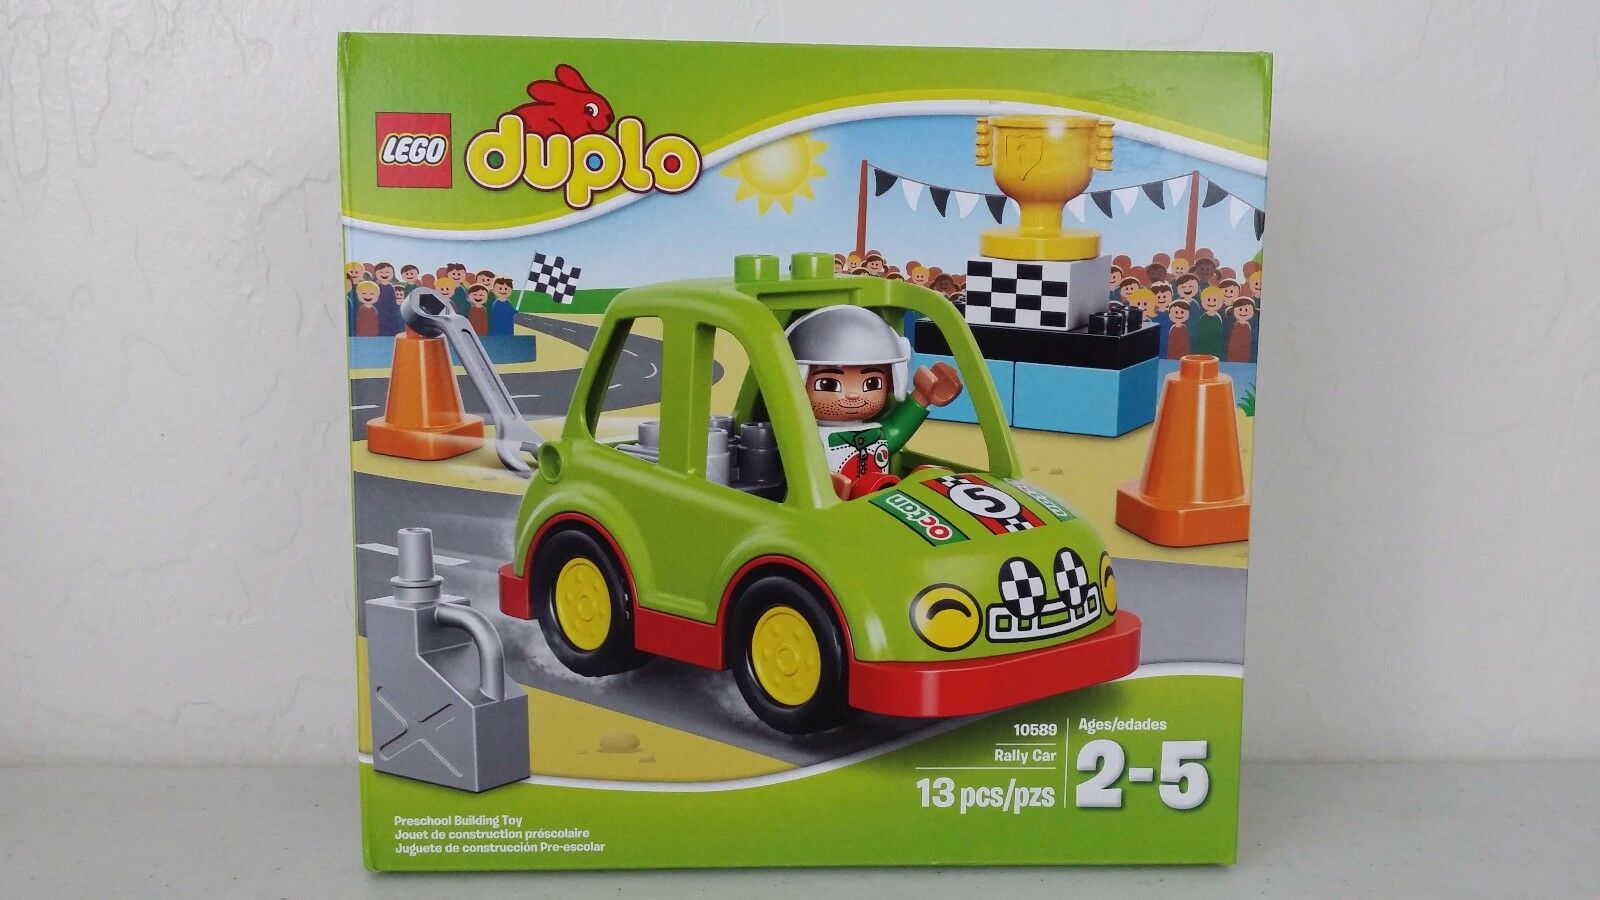 Lego duplo - rallye - 13 auto bild 13 - pcs spielzeug kinder 10589 neue kiste versiegelt 3379fa